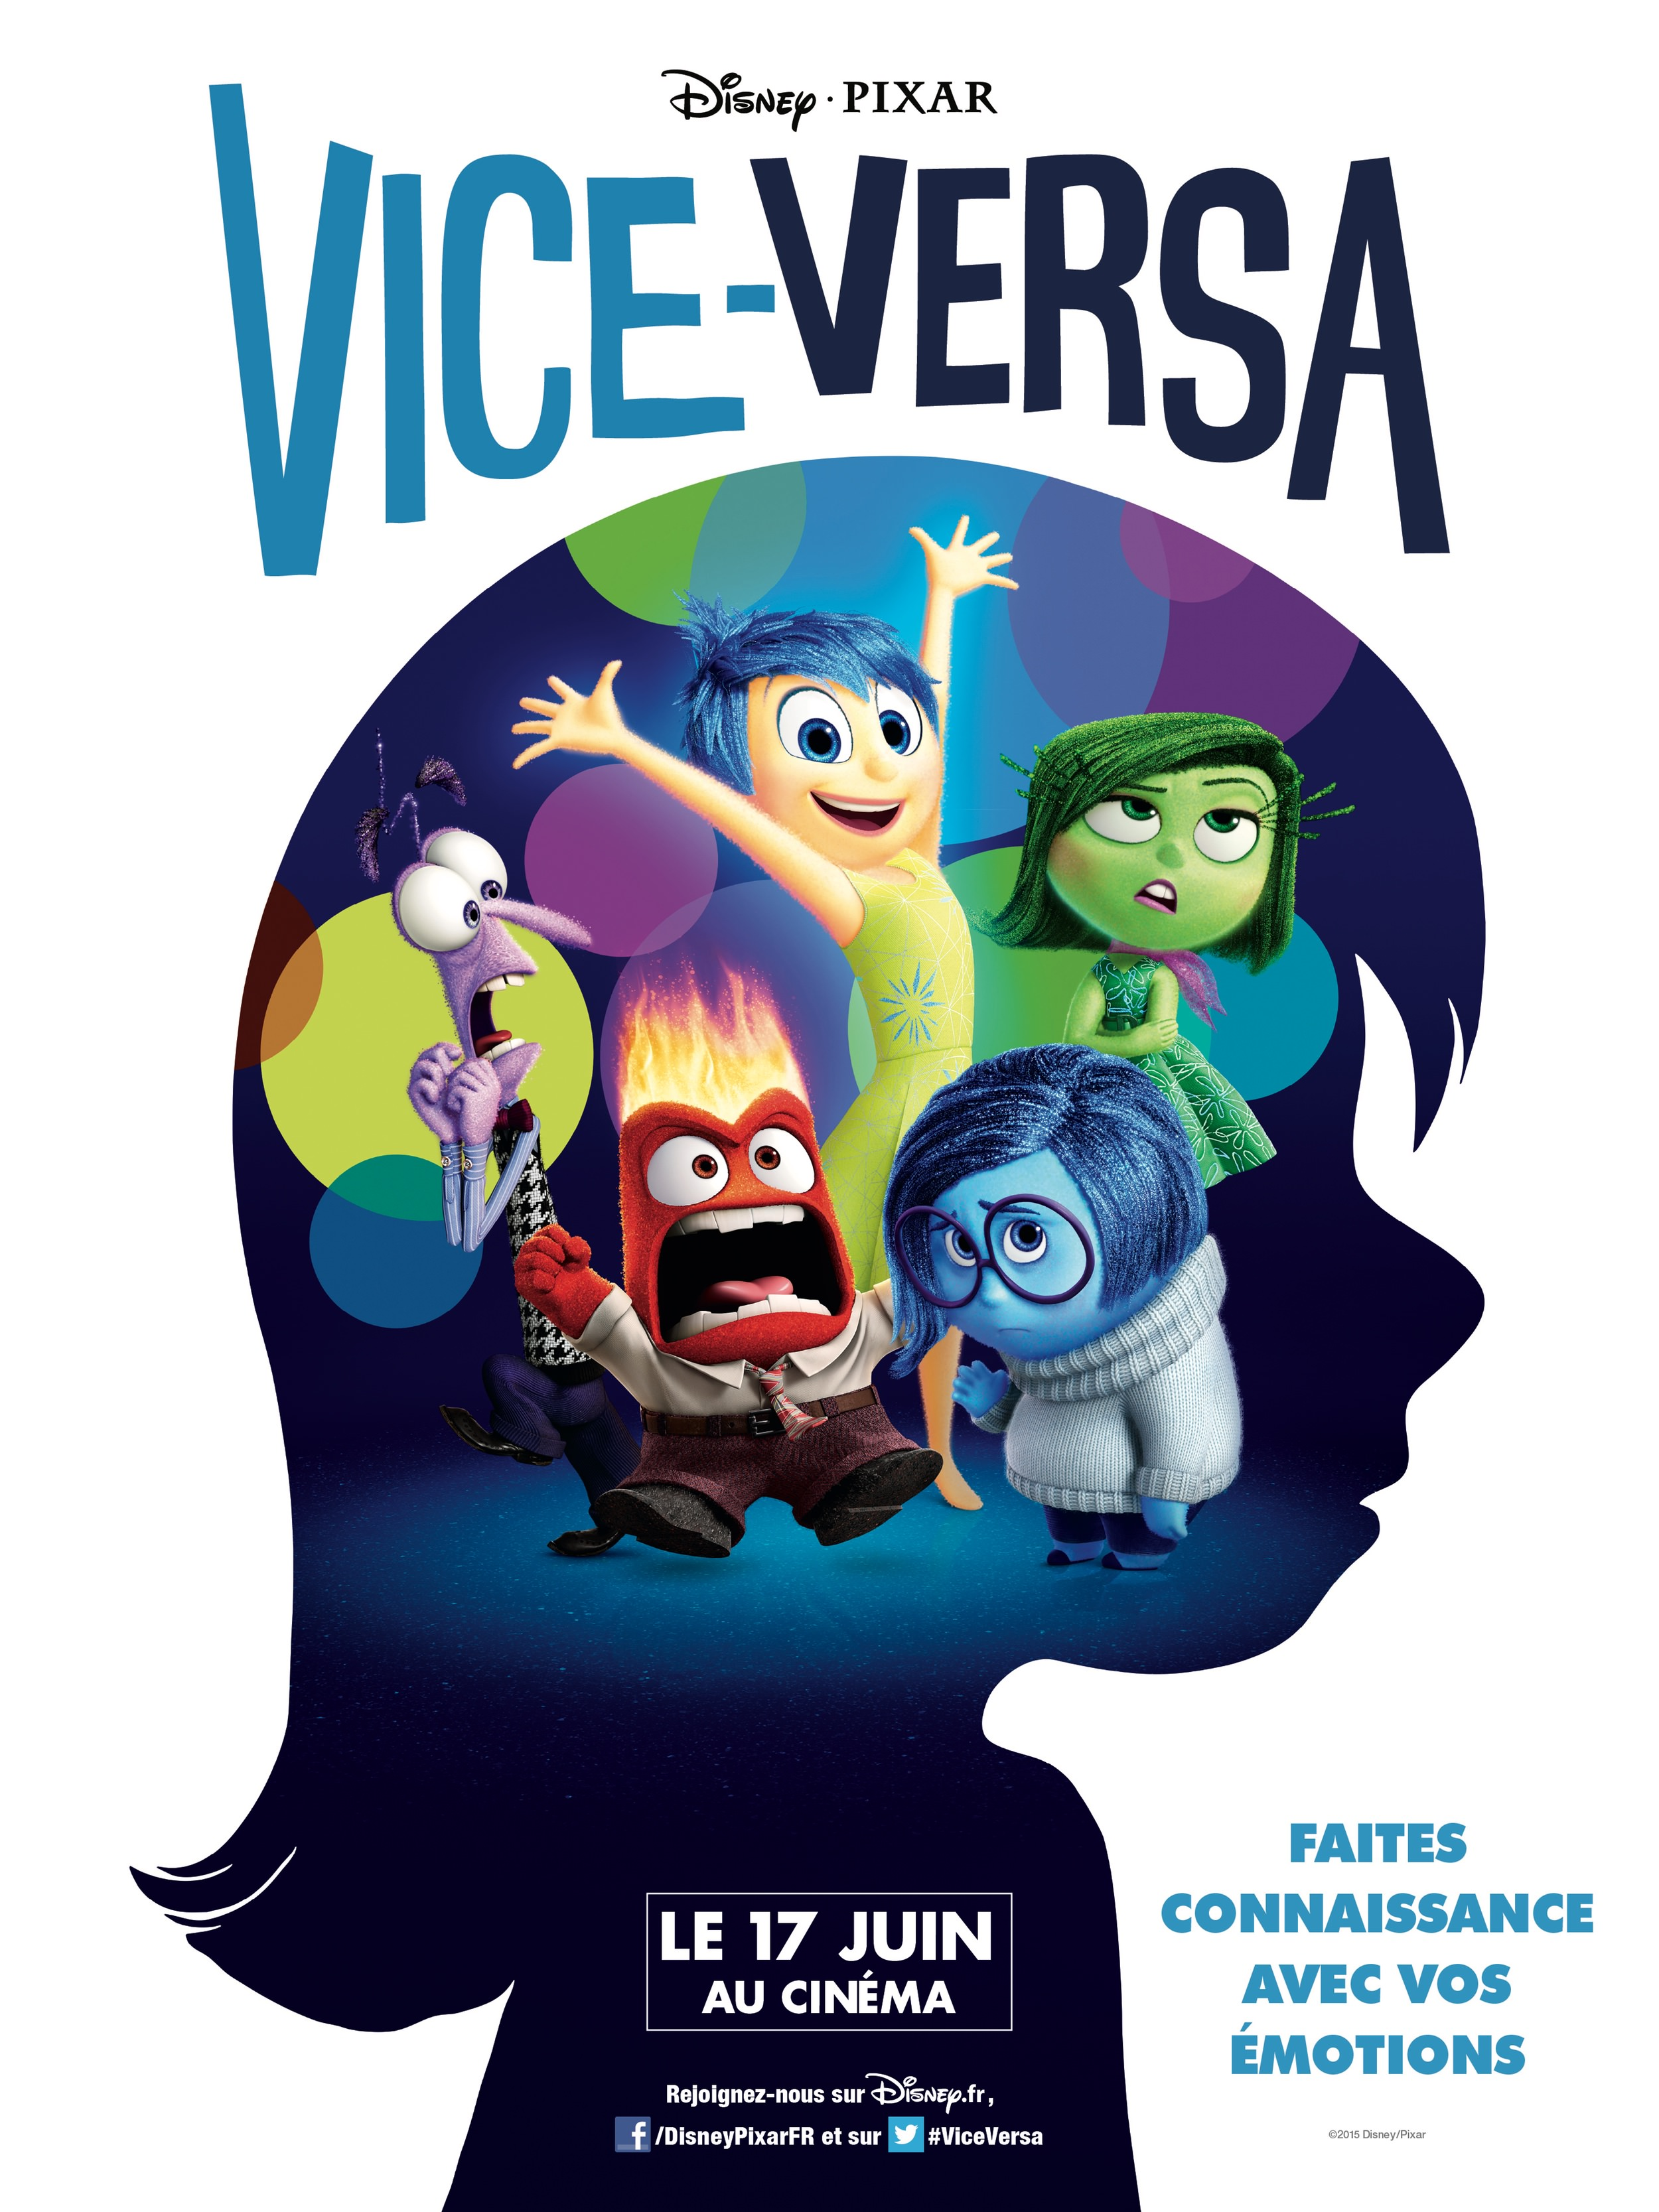 Vice versa docter carmen pixar